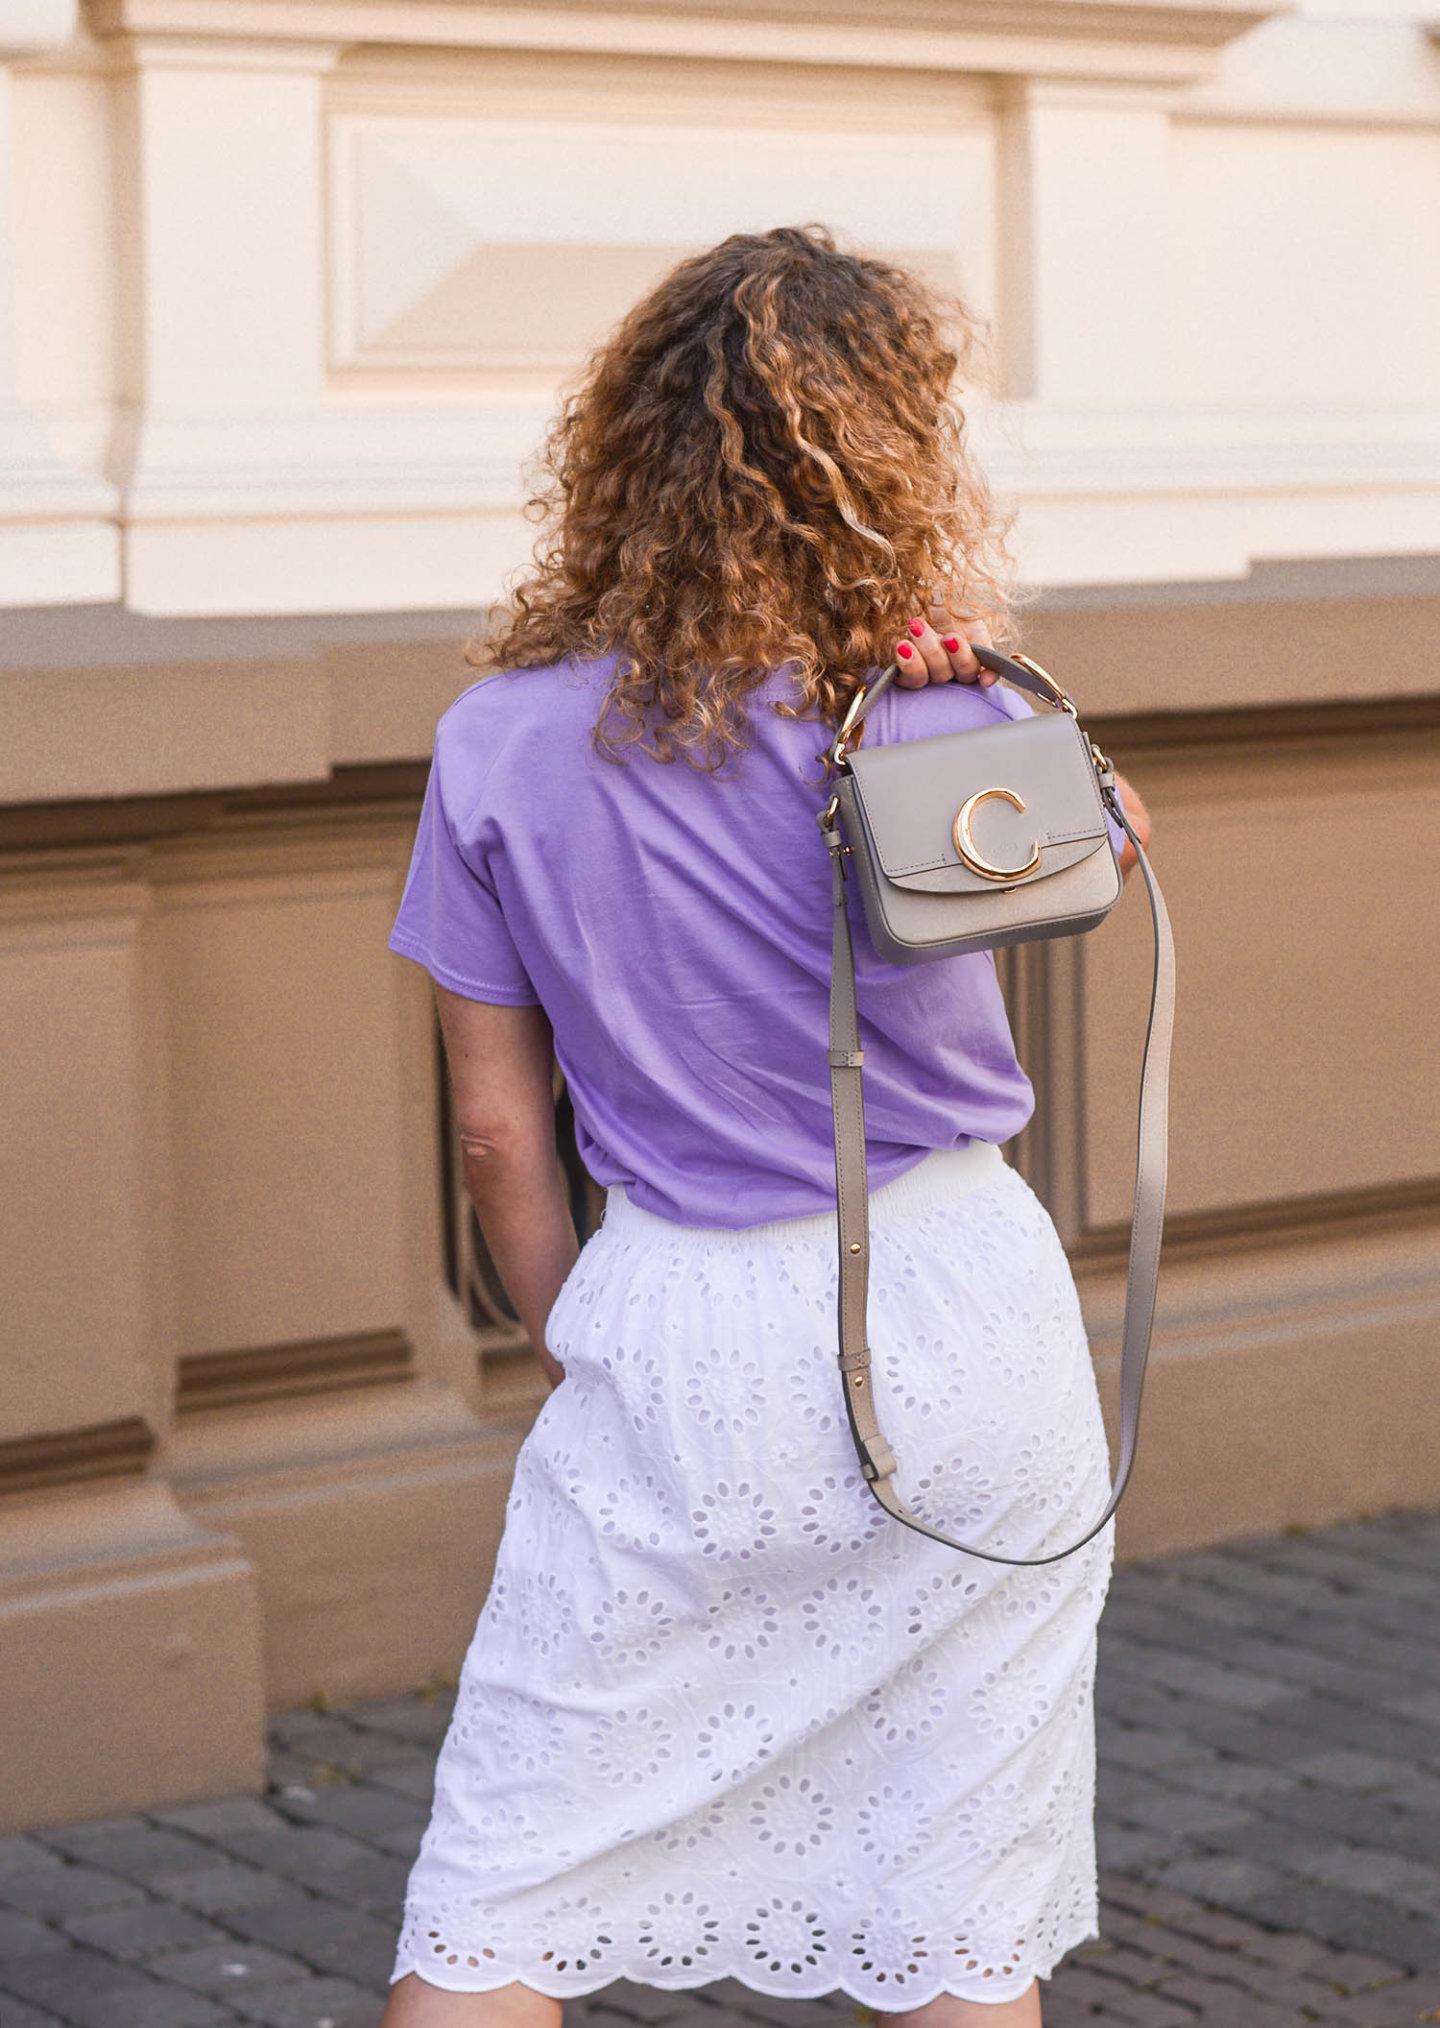 lilafarbenes shirt und schloé c-bag mini